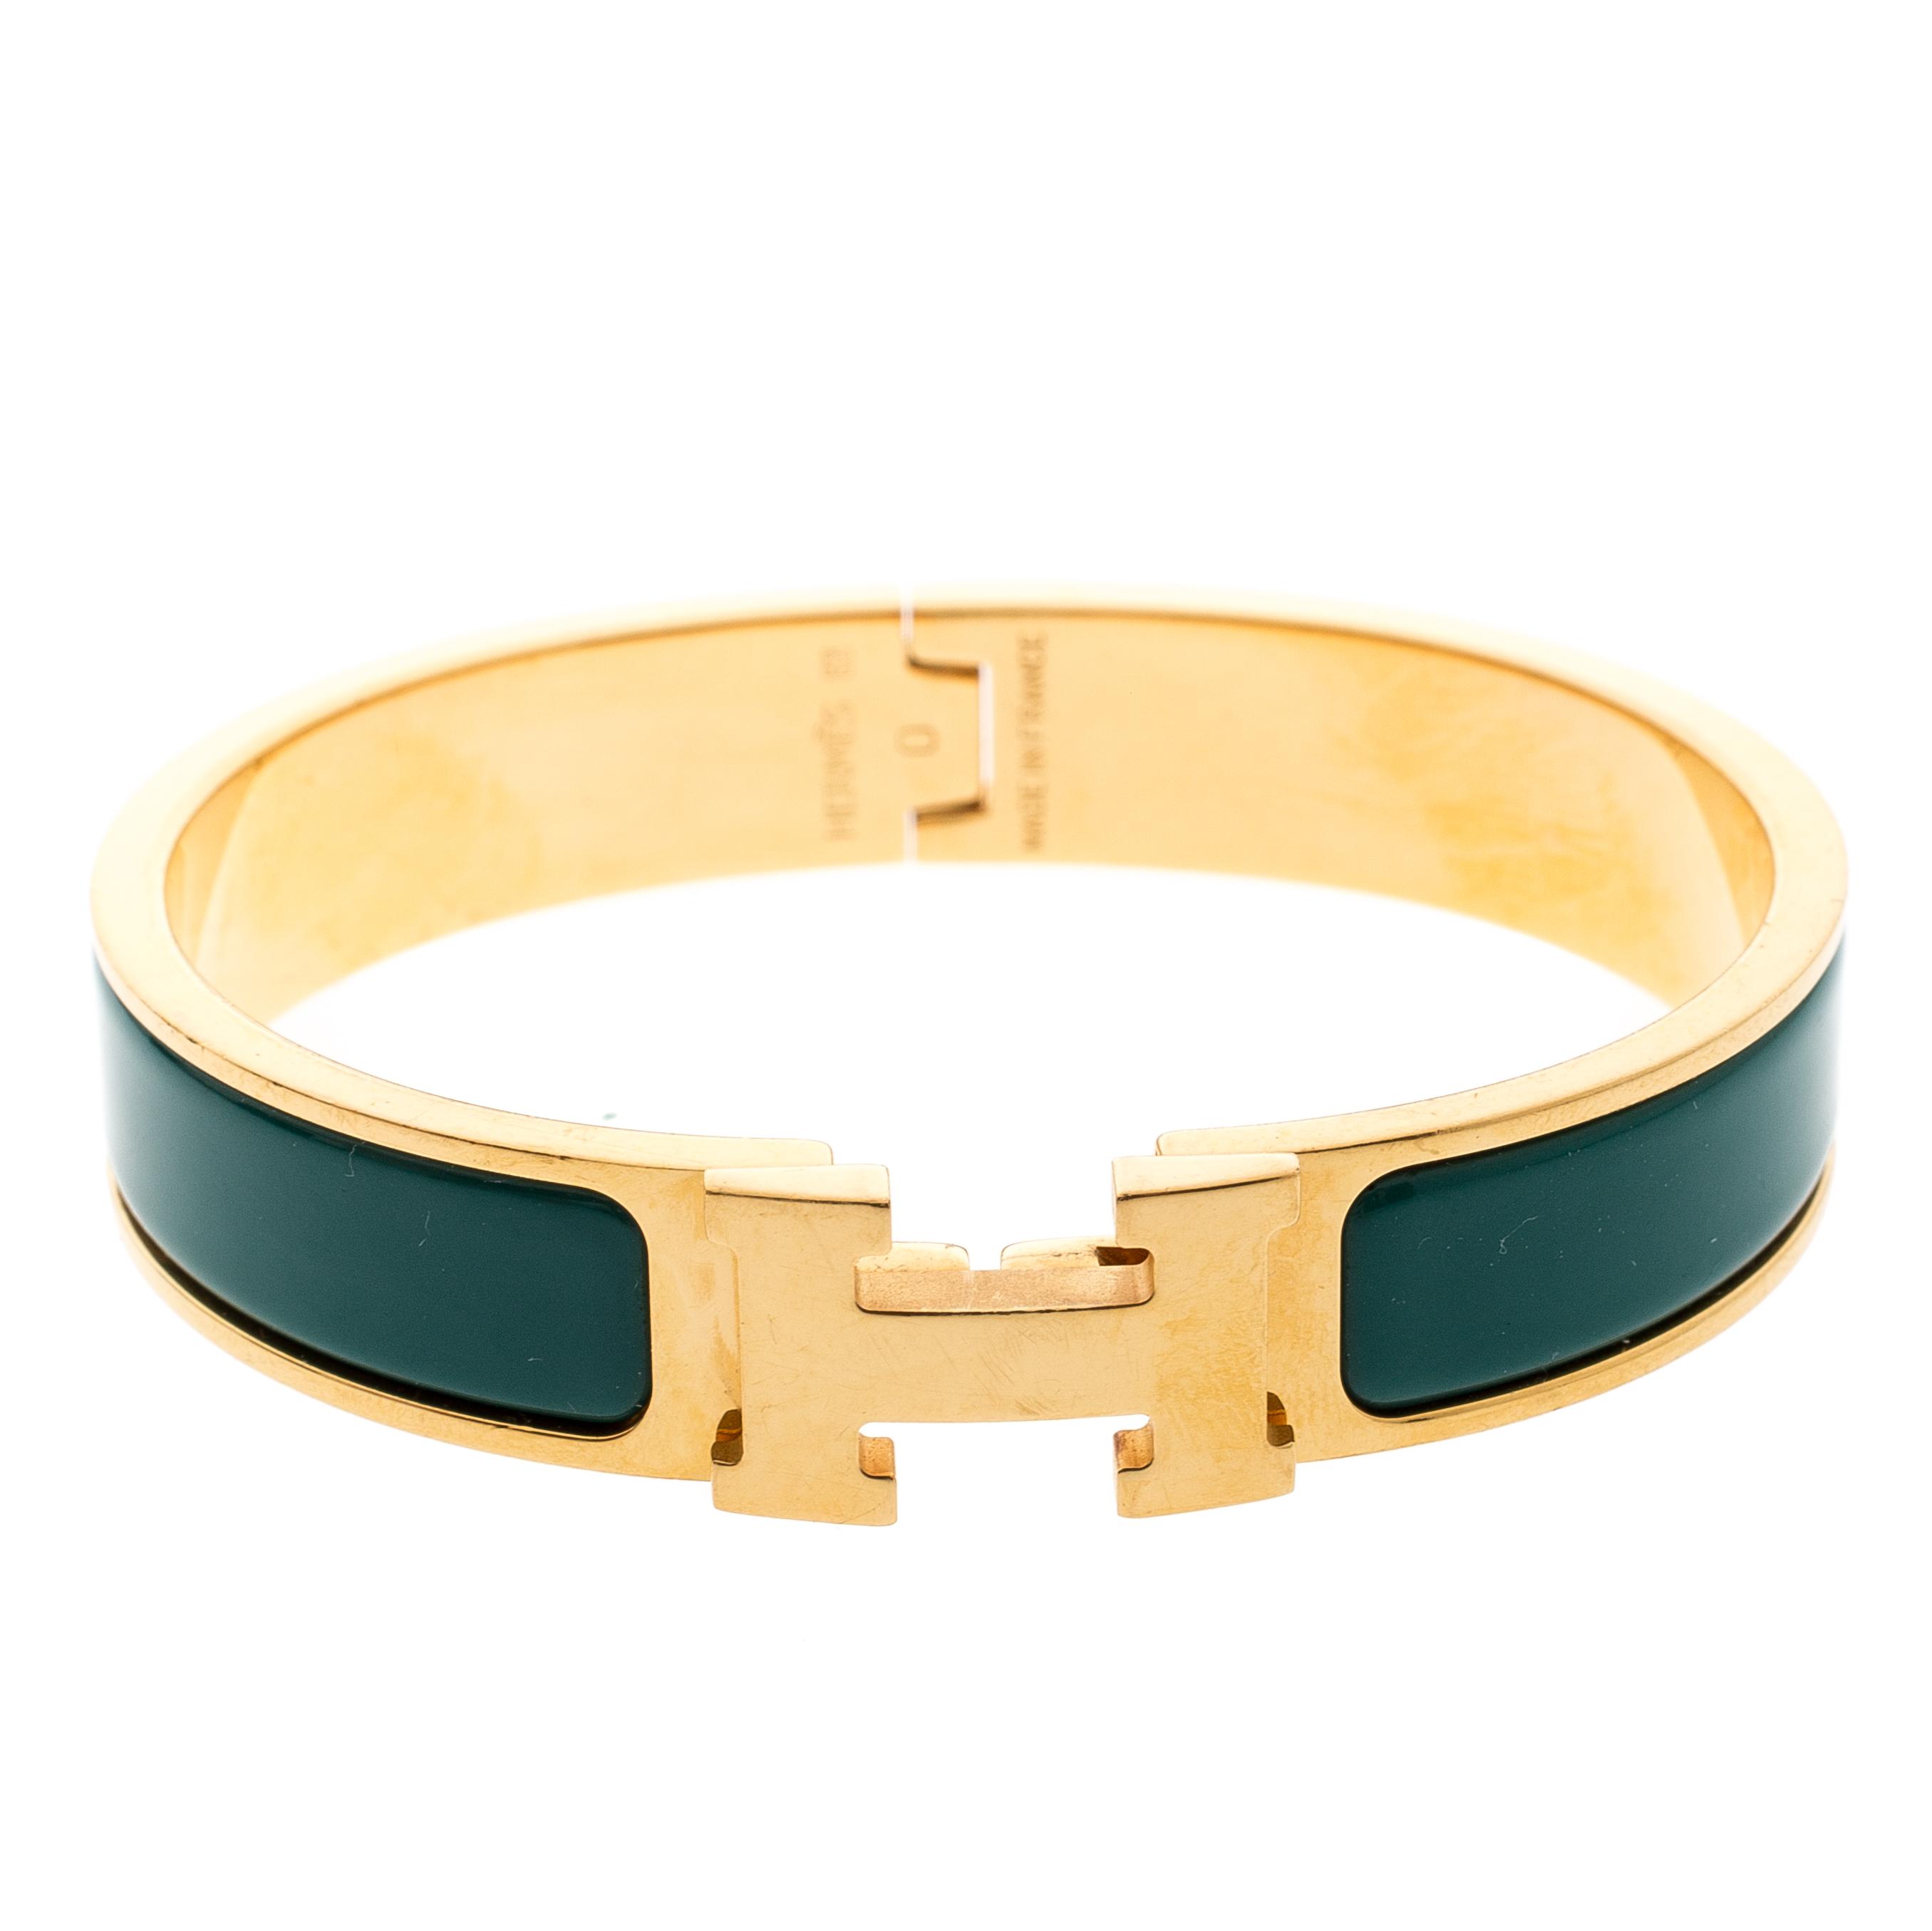 Hermes Clic Clac H Verona Green Enamel Gold Plated Narrow Bracelet Pm